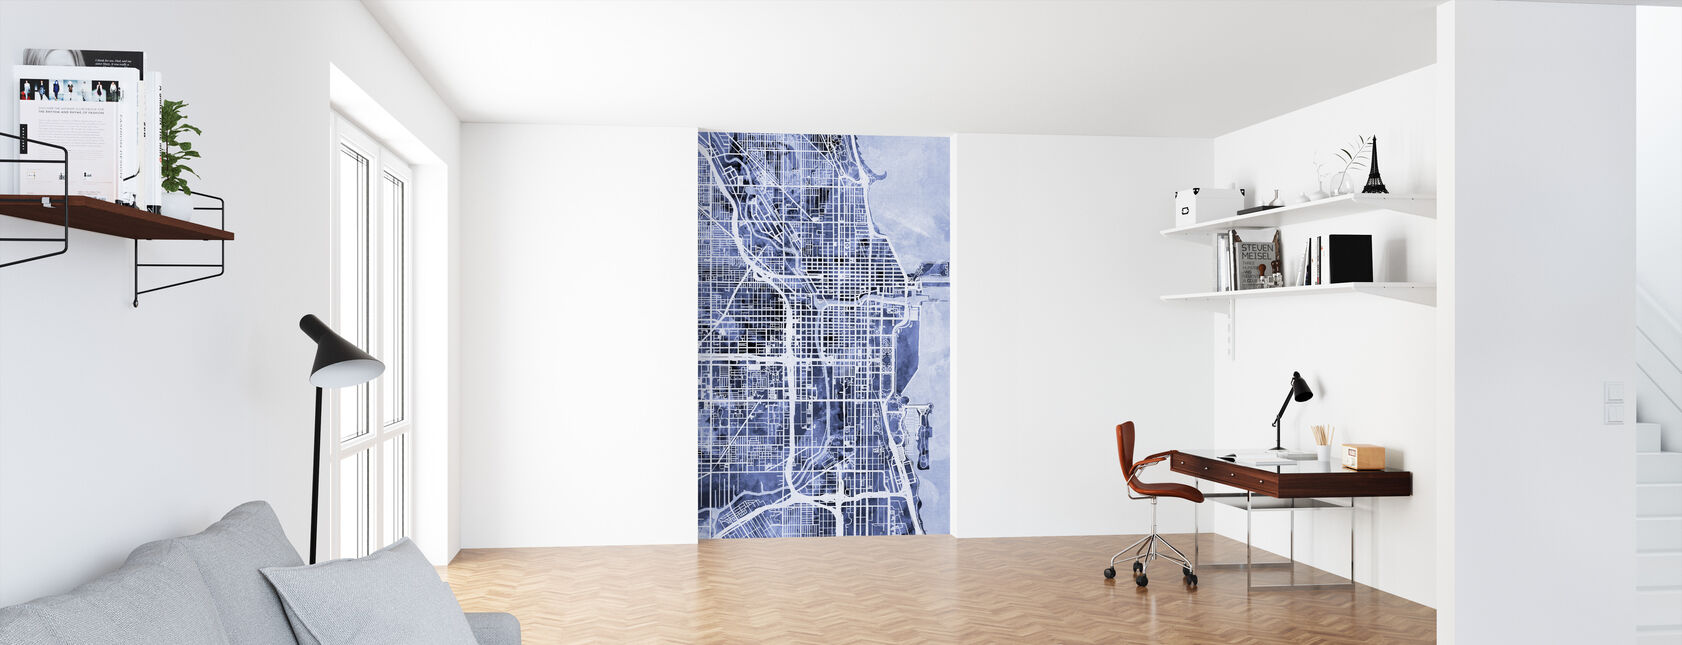 Chicago City Street Map - Wallpaper - Office